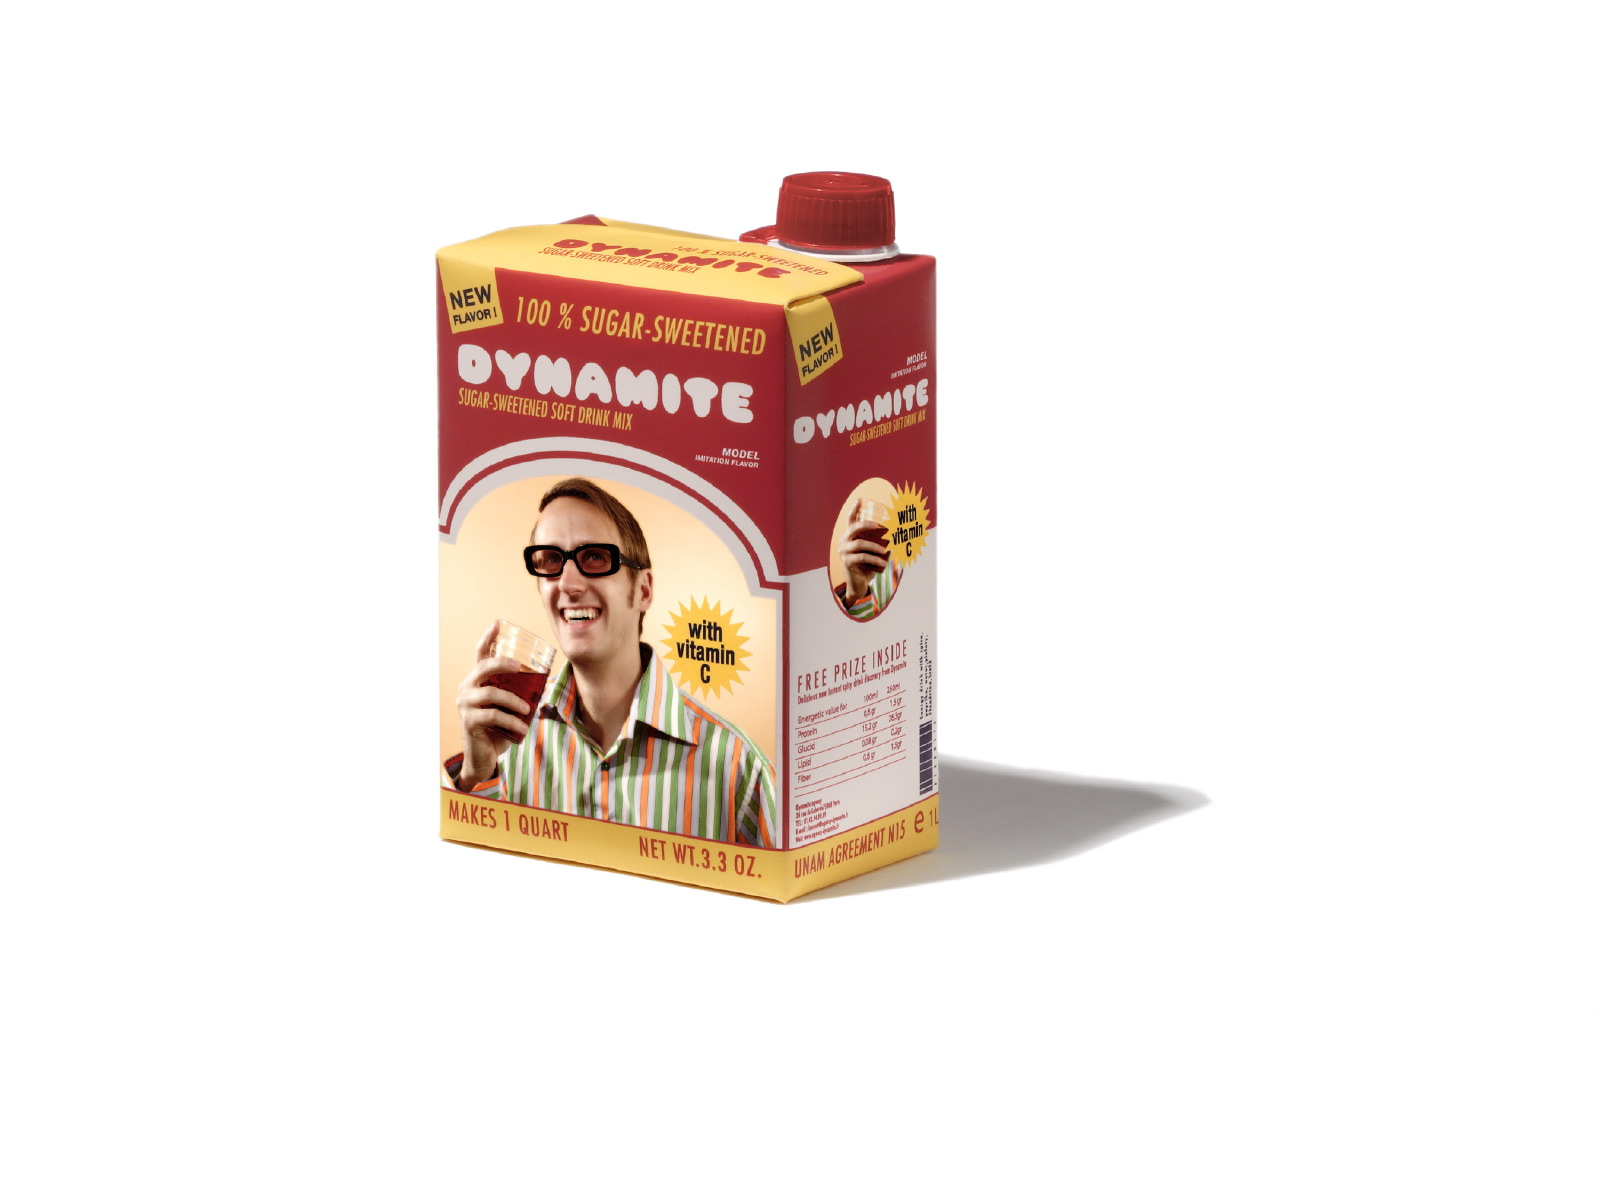 Dynamite model agency